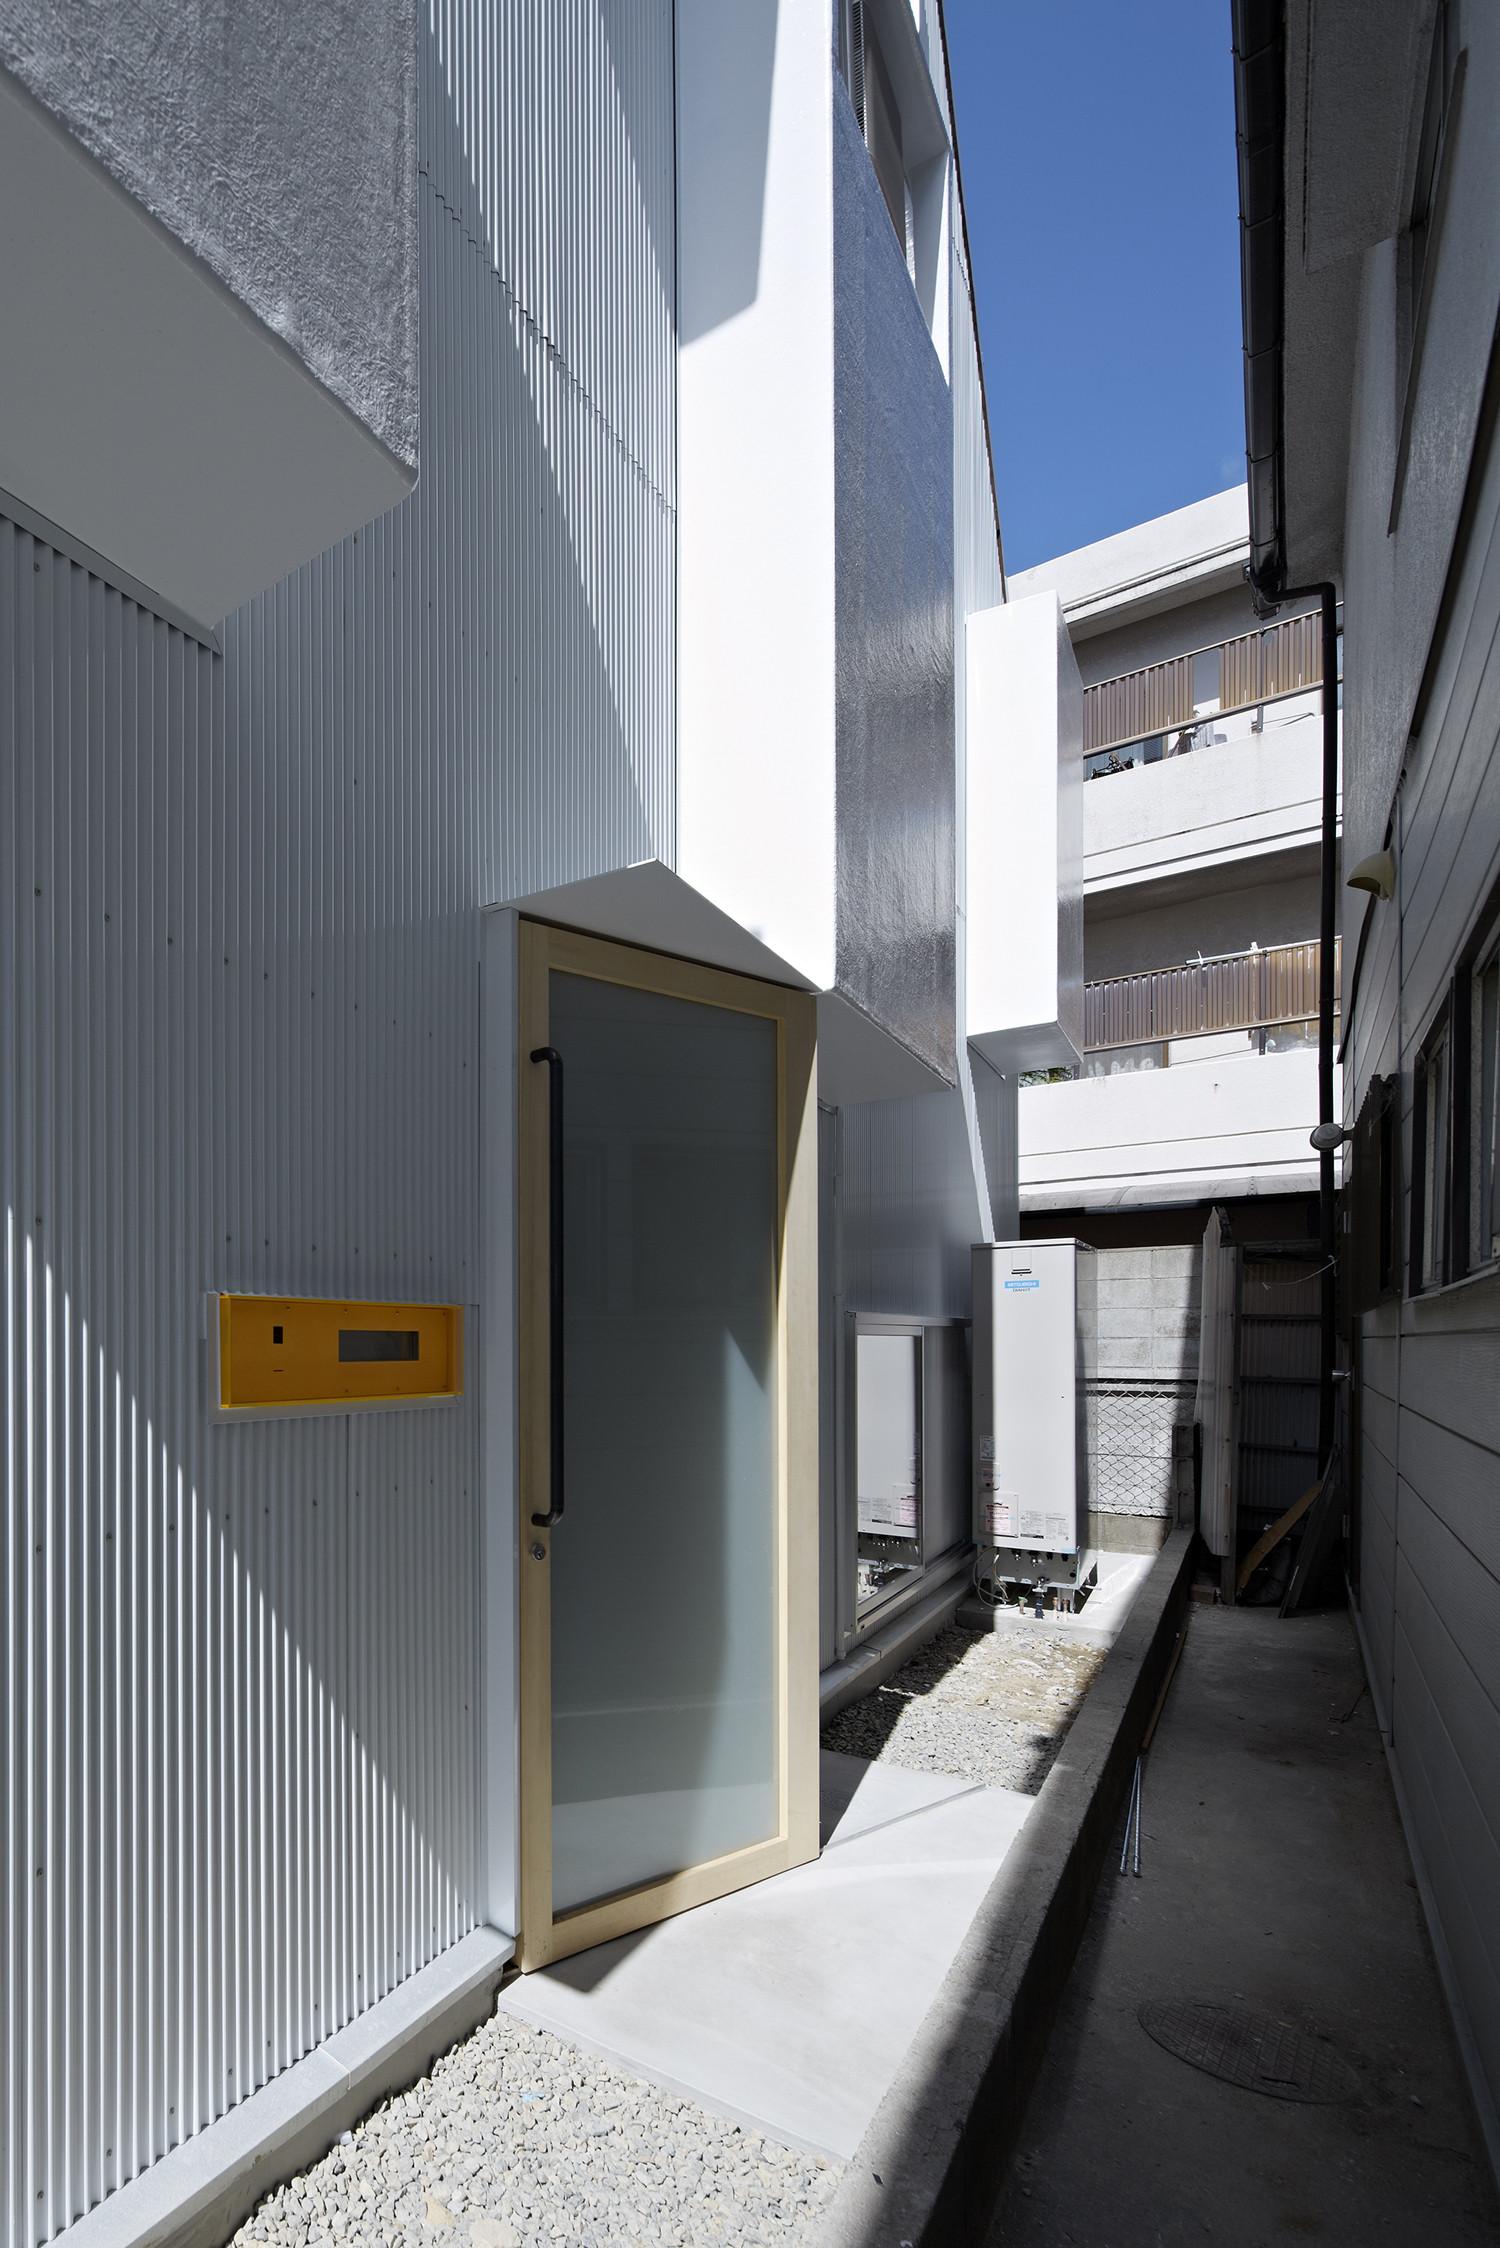 House in Itami / Tato Architects